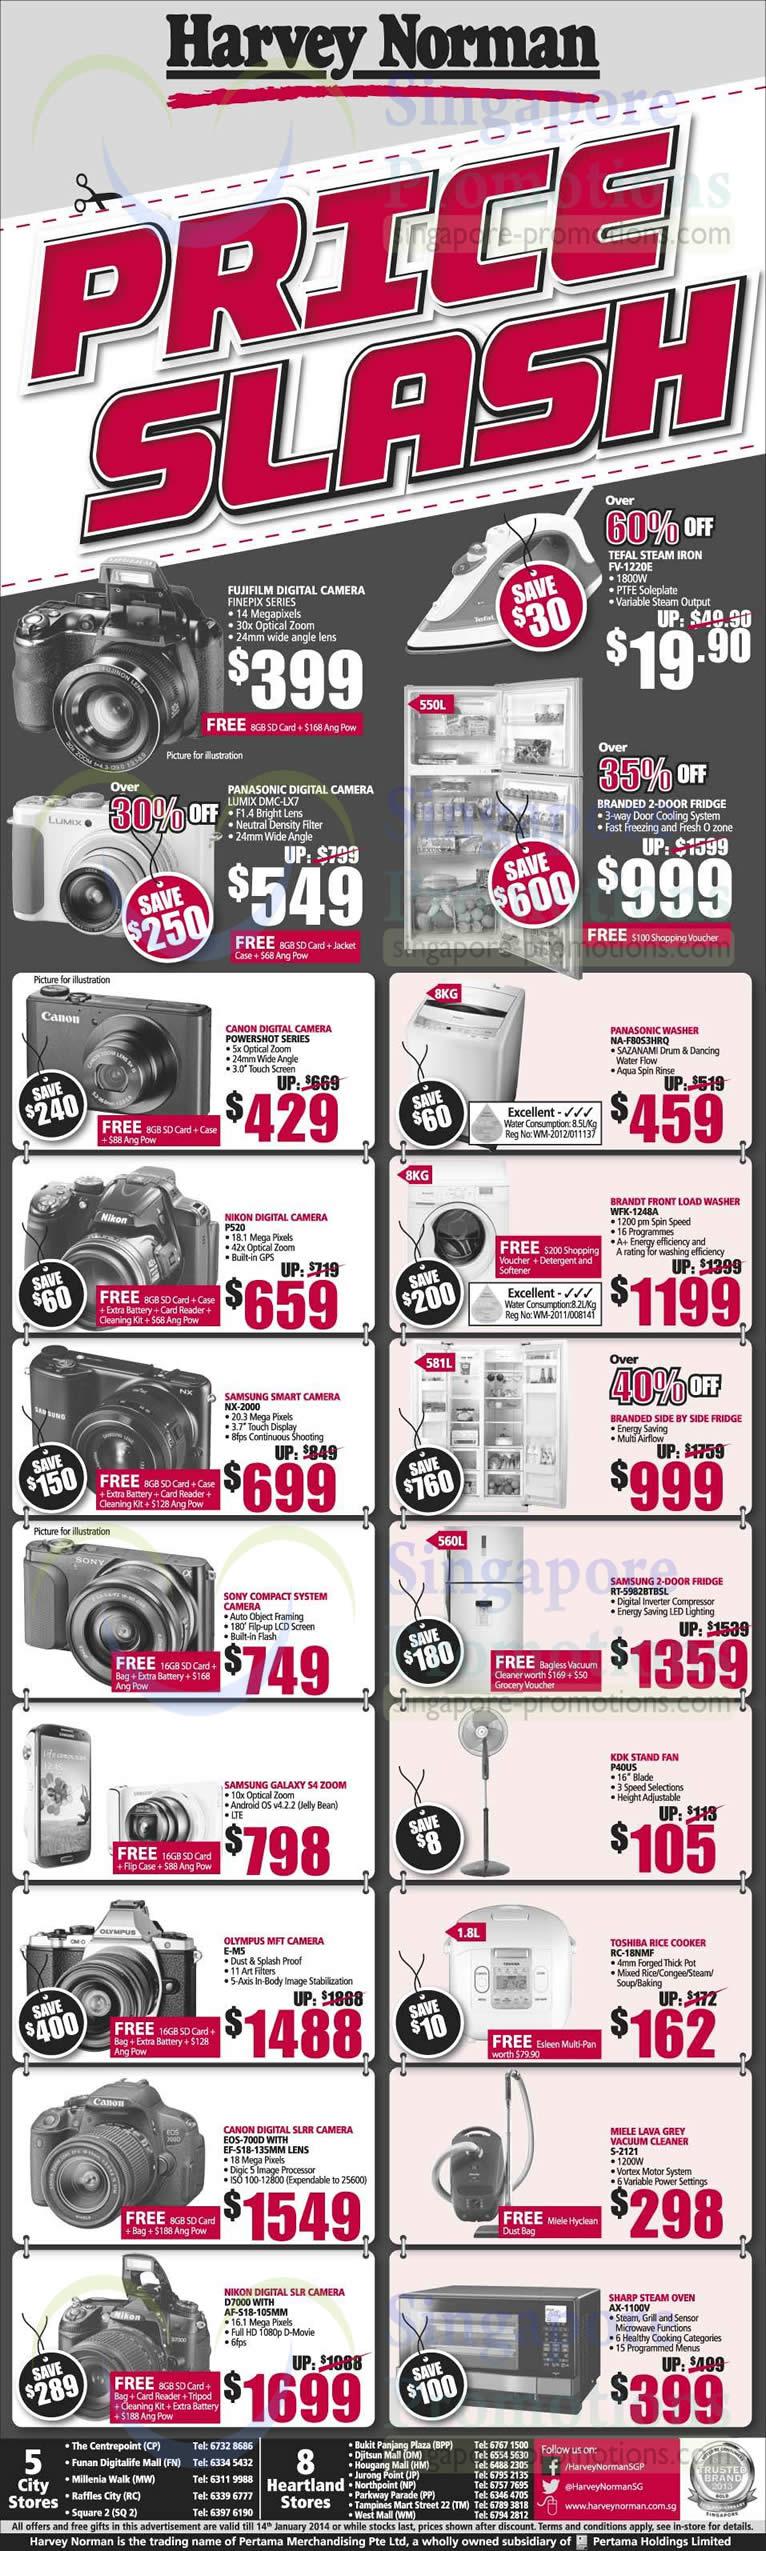 Panasonic DMC-LX7 Digital Camera, Panasonic NA-F80S3HRQ Washer, Nikon P520 Digital Camera, Brandt WFK-1248A Washer, Samsung NX-2000 Digital Camera, Samsung RT-5982BTBSL Fridge, Samsung Galaxy S4 Zoom, KDK P40US Fan, Olympus E-M5 Digital Camera, Toshiba RC-18NMF Rice Cooker, Canon EOS 700D DSLR Digital Camera, Miele S-2121 Vacuum Cleaner, Nikon D7000 DSLR Digital Camera and Sharp AX-1100V Oven